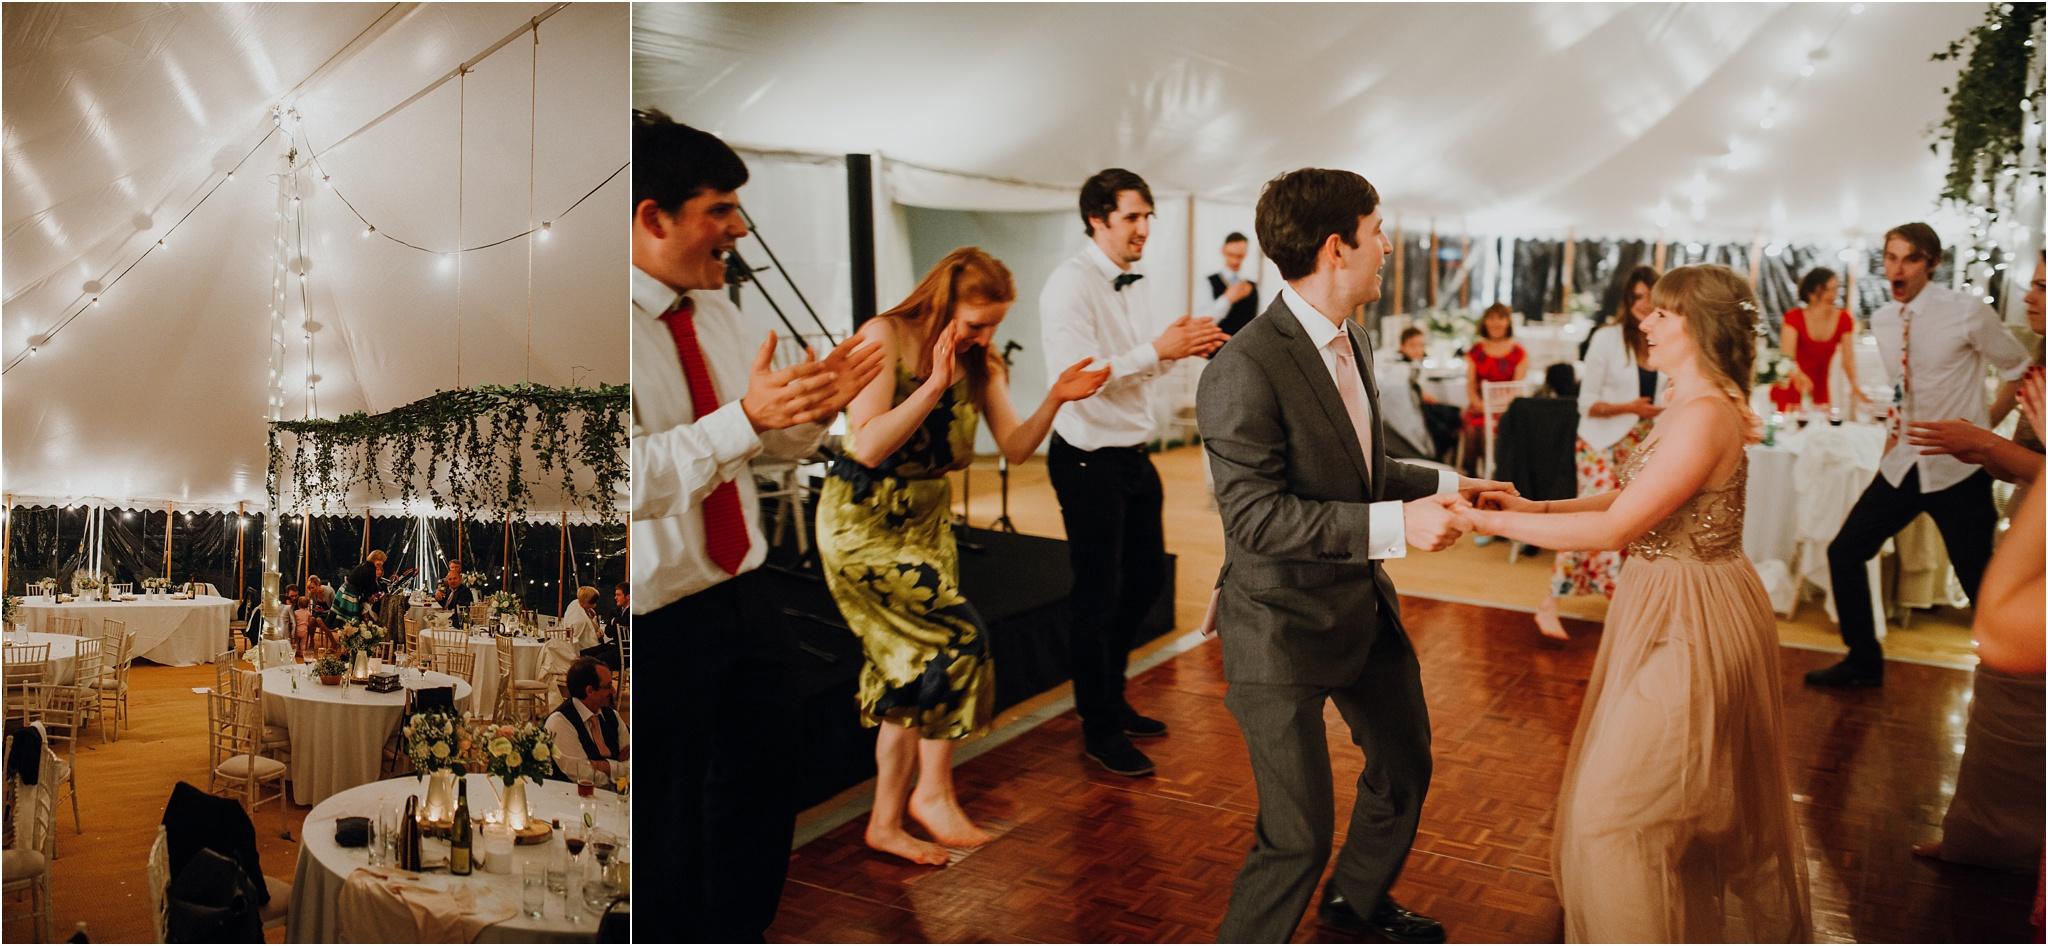 Outdoor-country-wedding-Edinburgh-photographer__0141.jpg